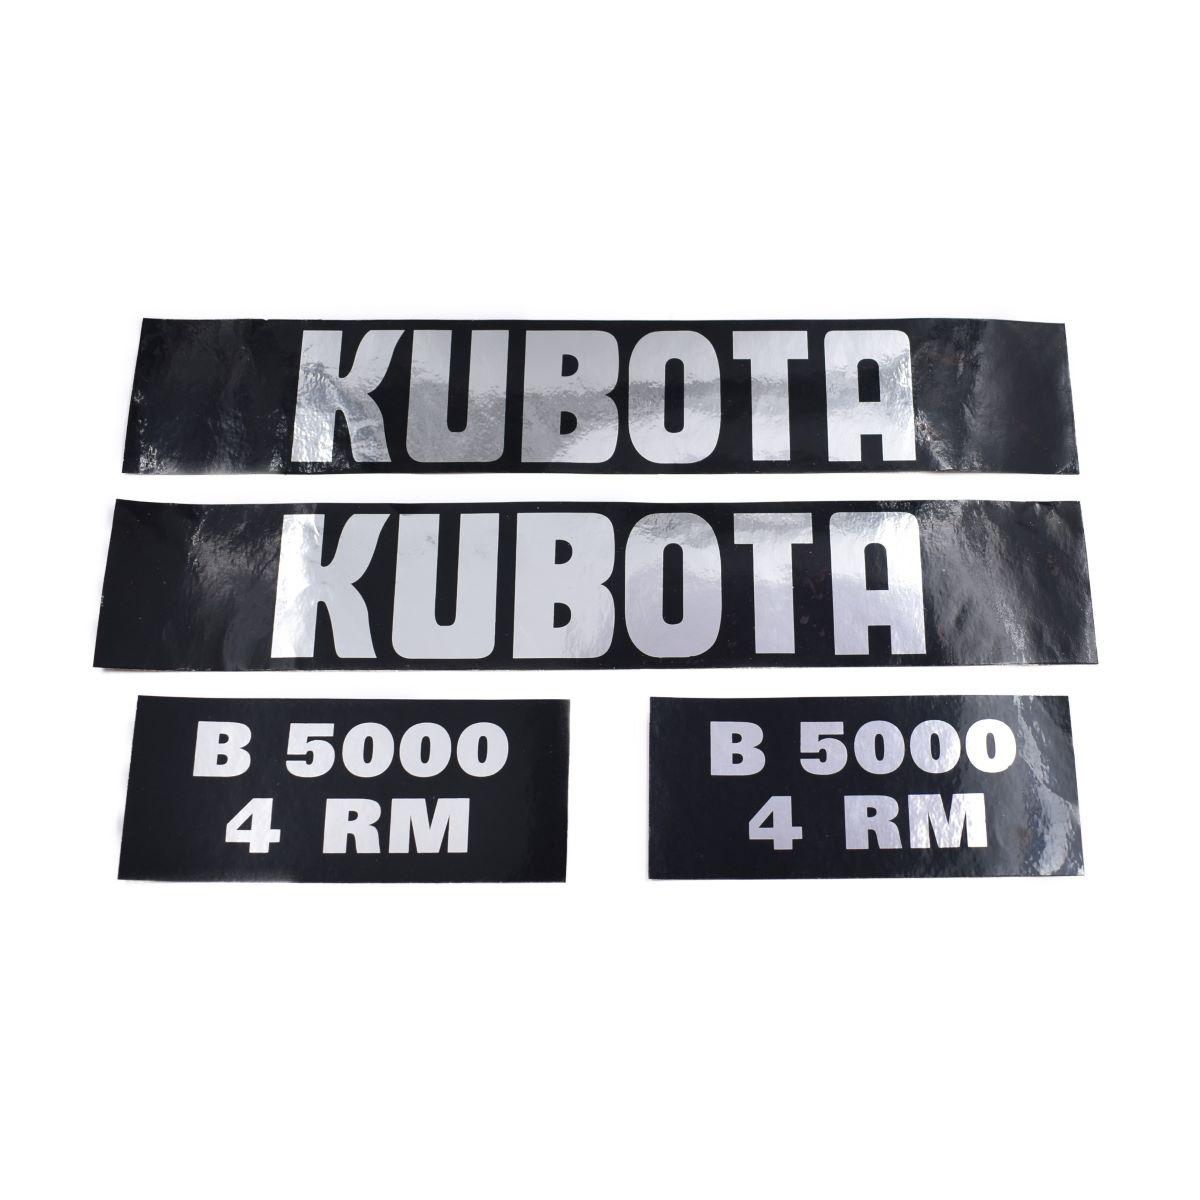 Sticker set Kubota B5000